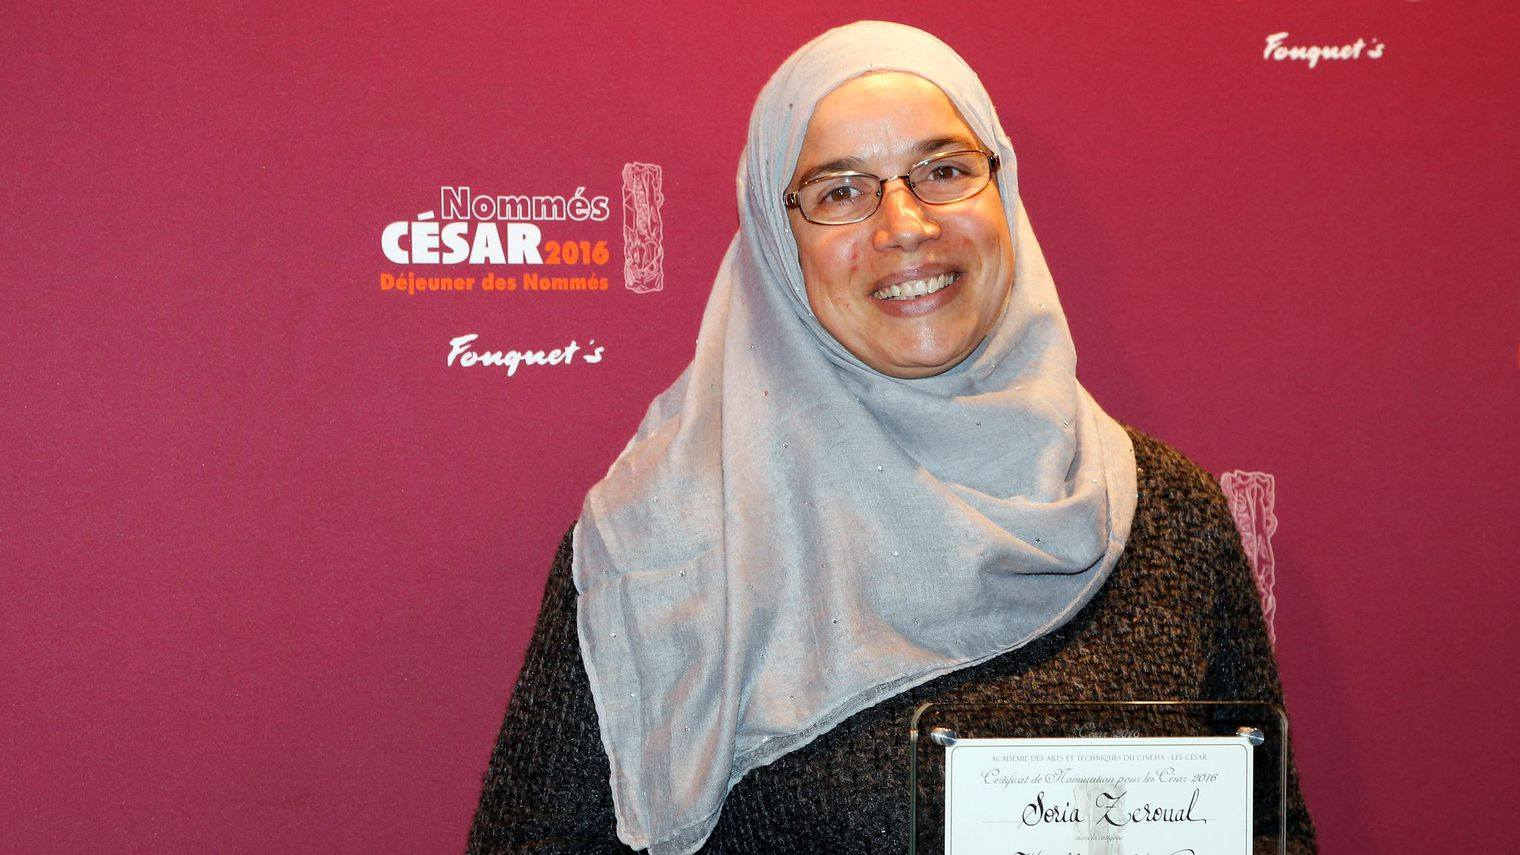 Fatima César du Meilleur Film de 2015, analyse